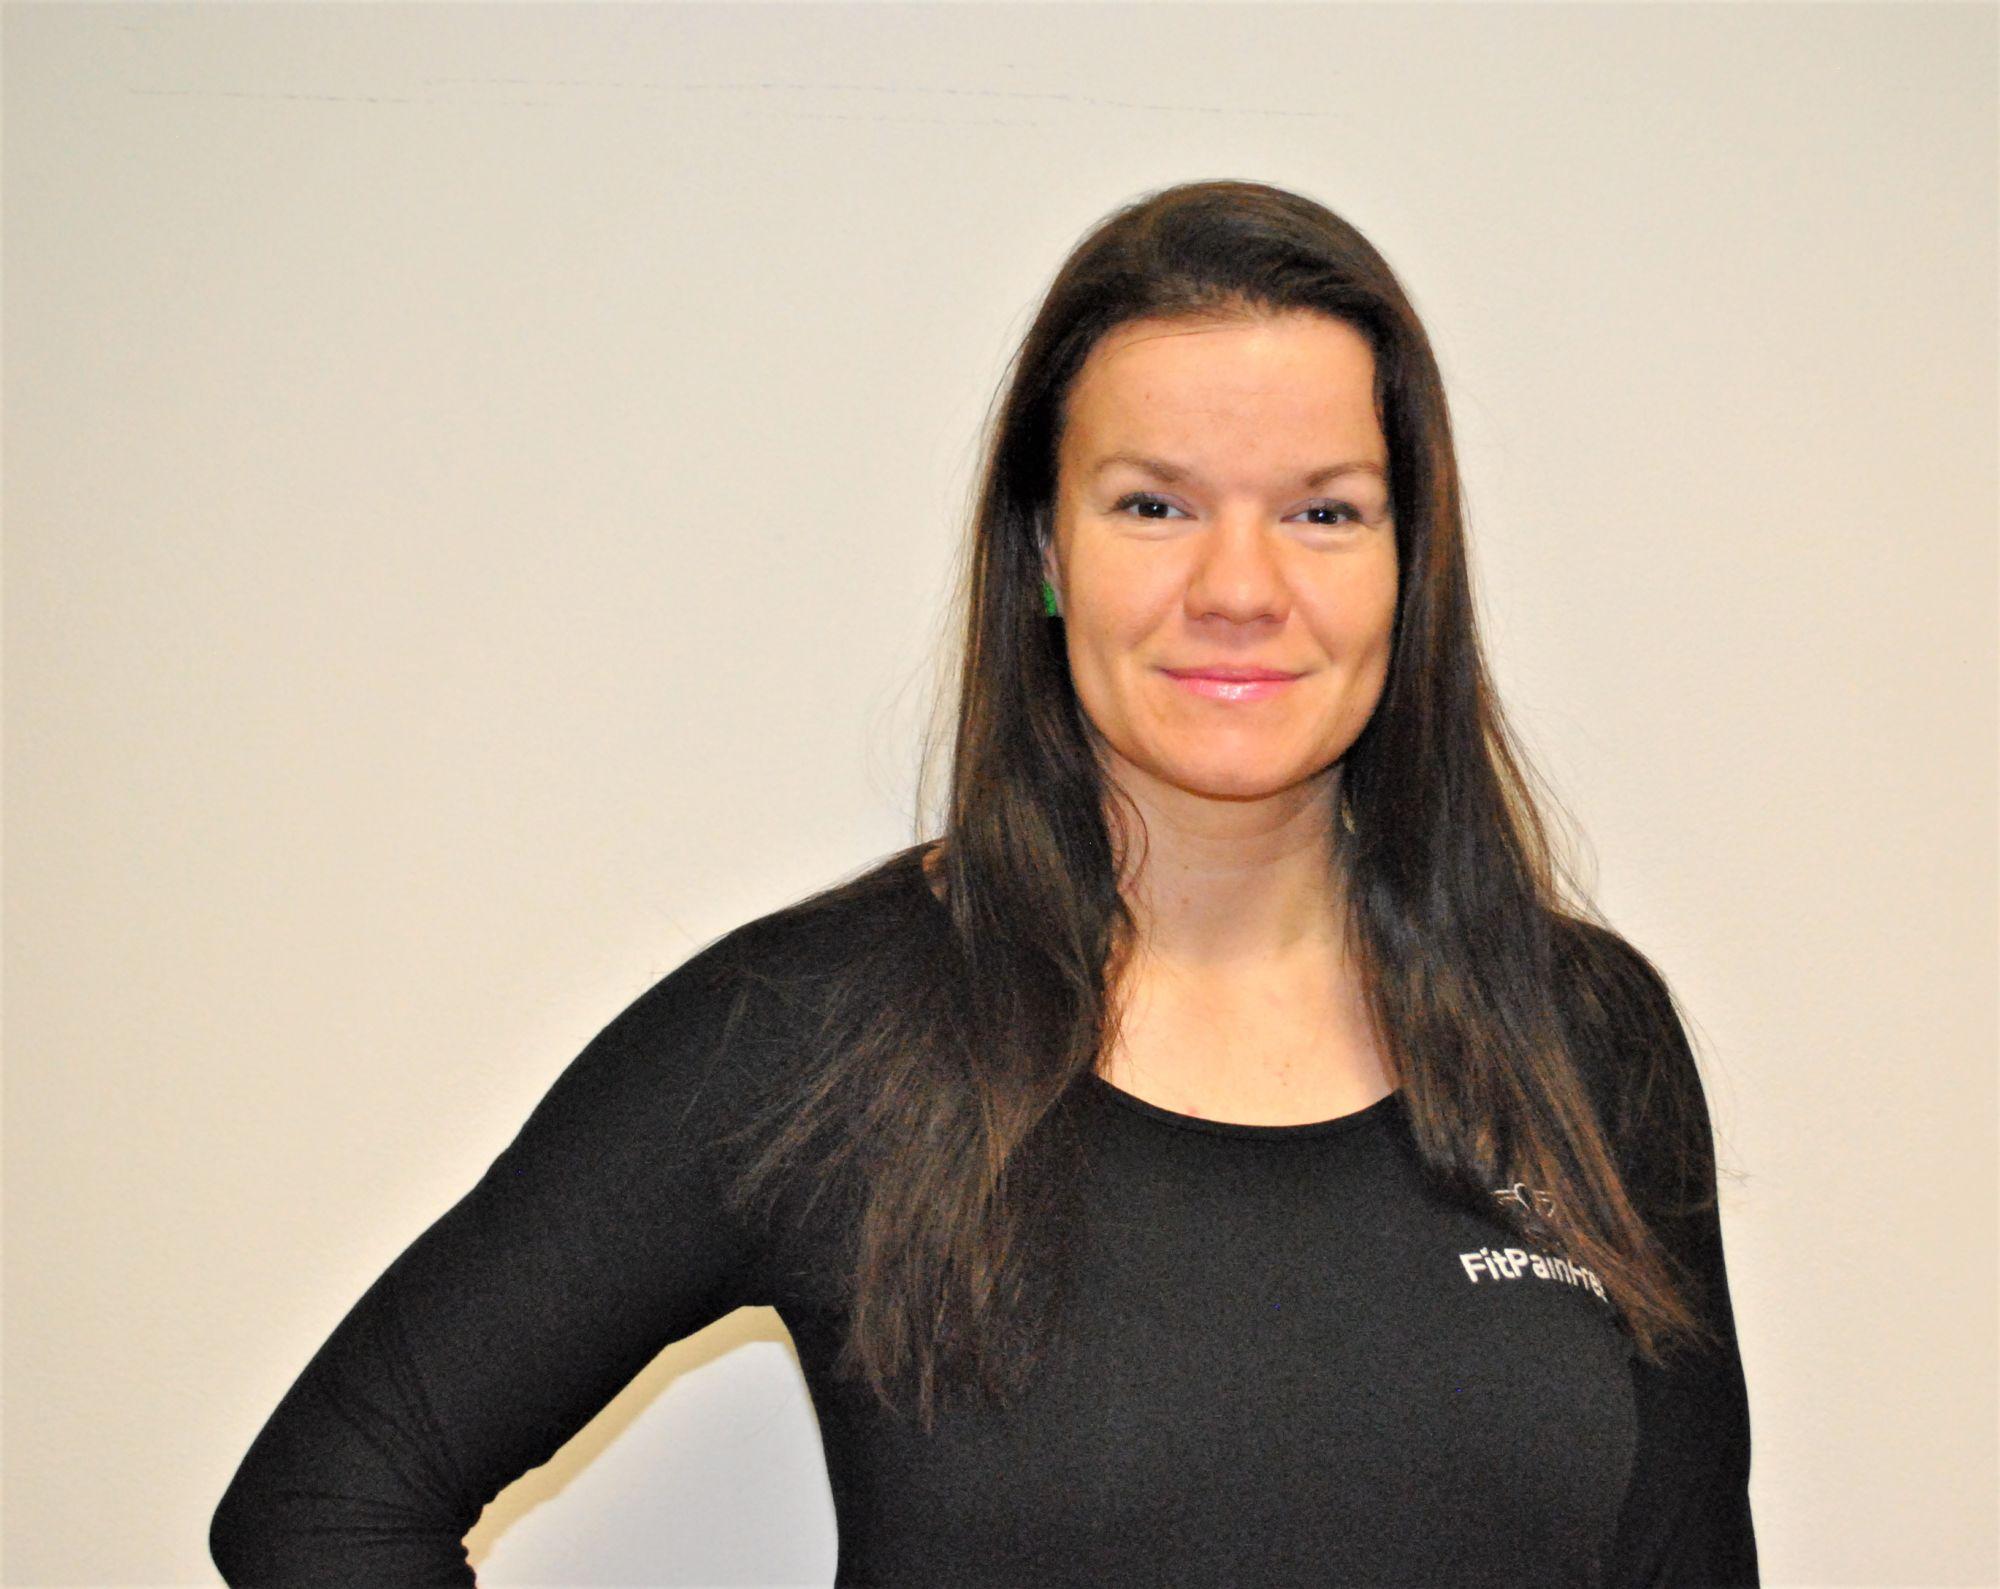 vendula-stastna-fitpainfree-lector-instructor-zdarnadsazavou-cviceni-rehabilitace-fyzioterapie-hanatoufarova